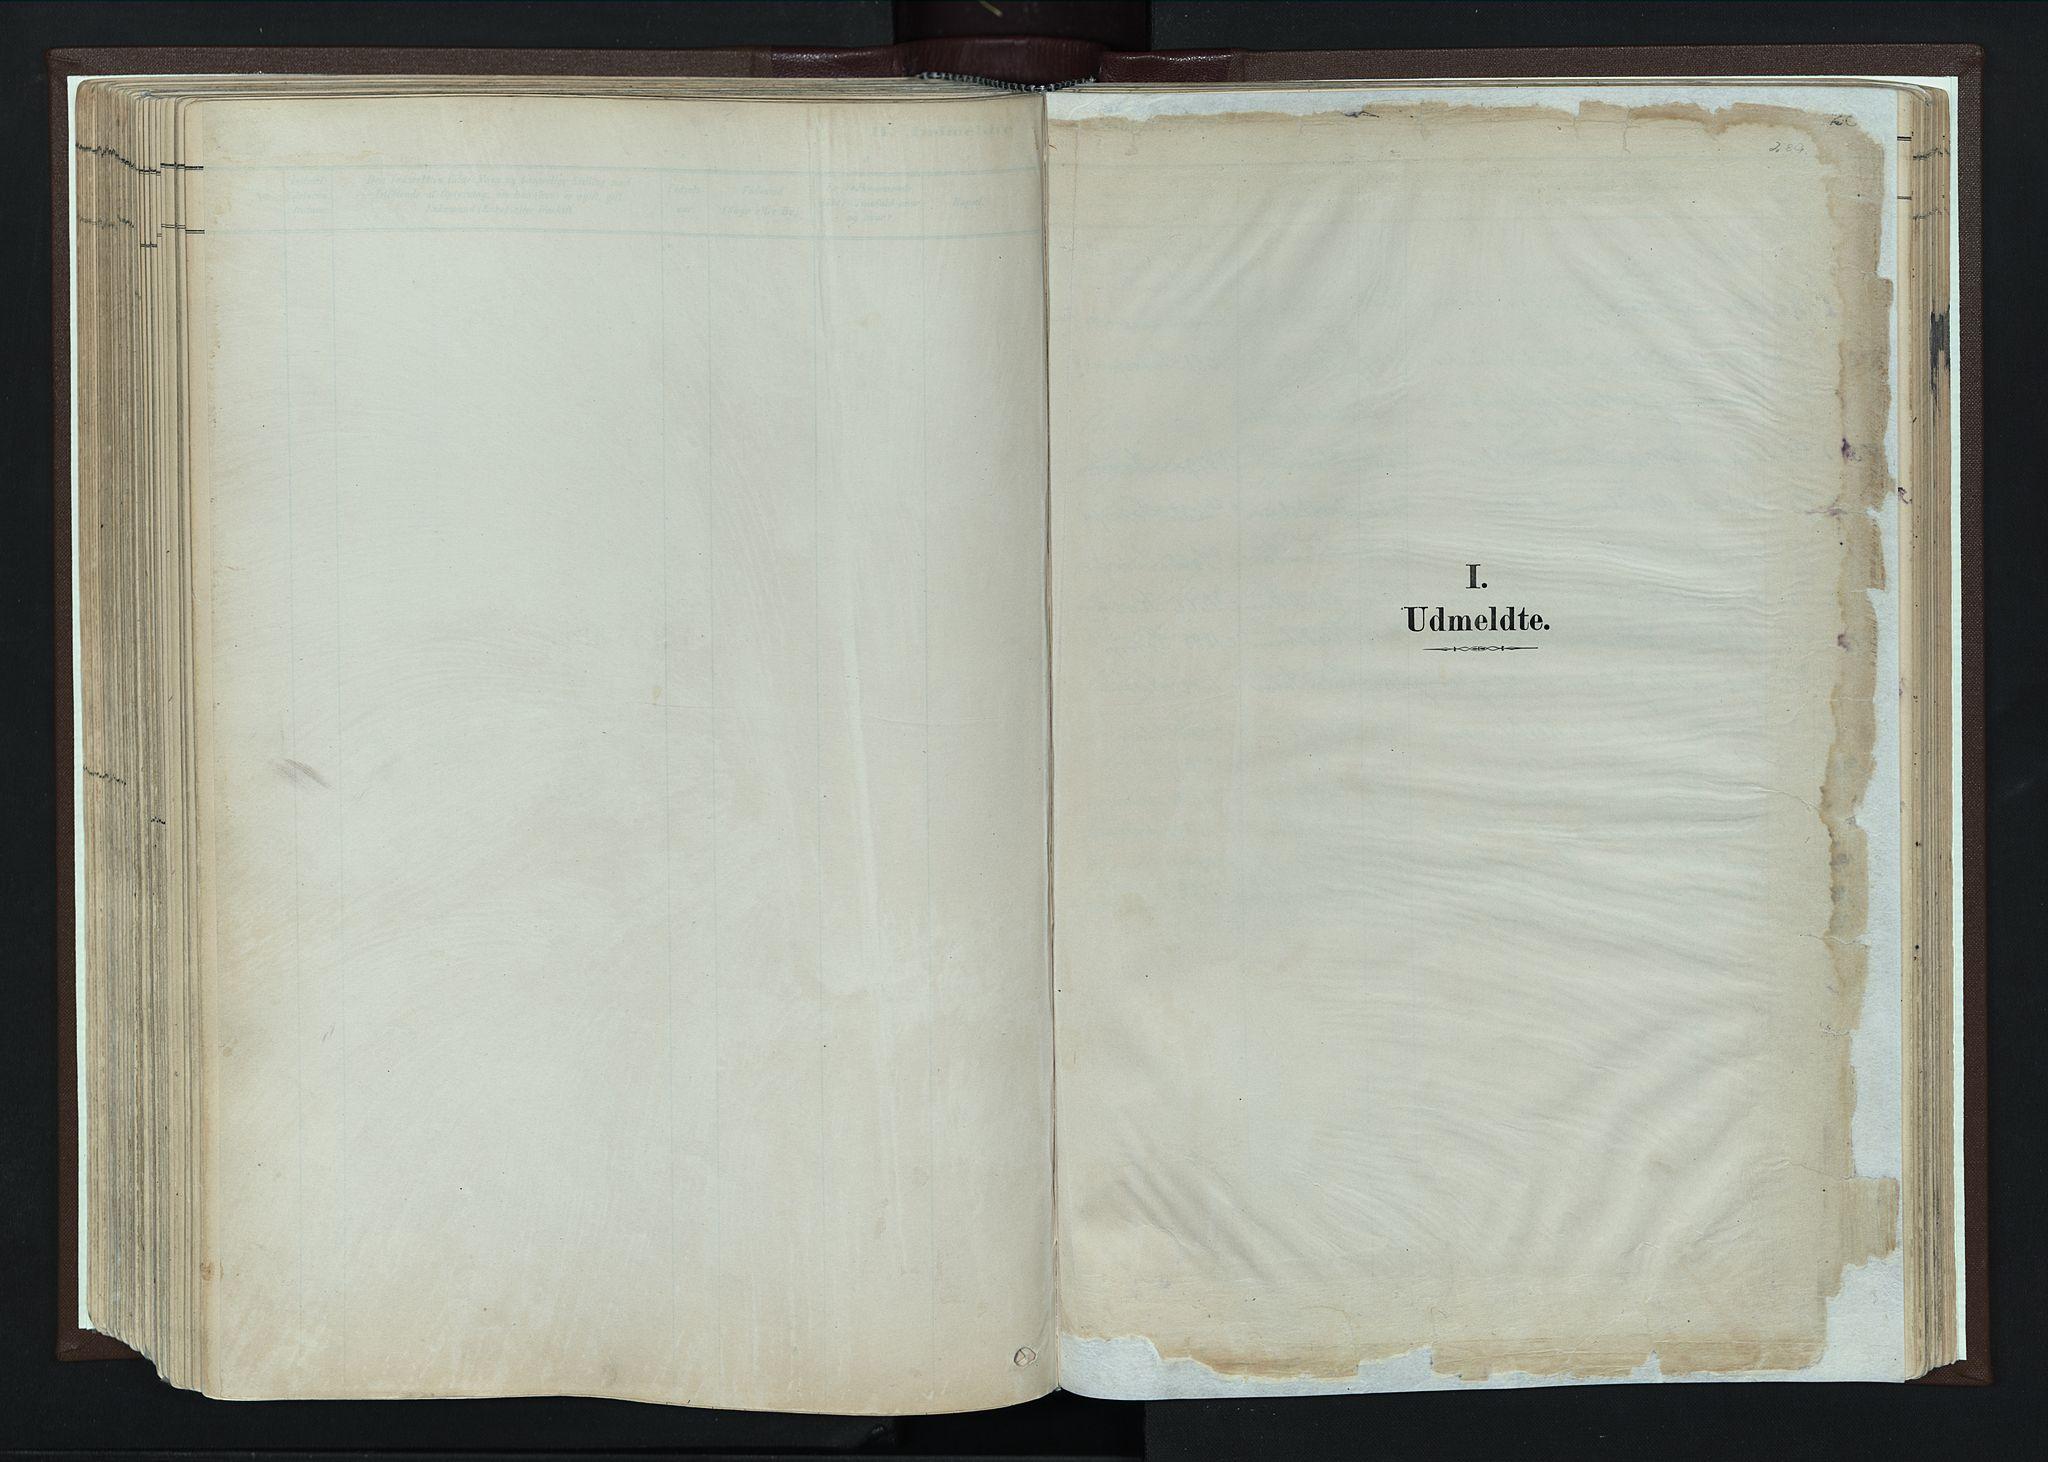 SAH, Nord-Fron prestekontor, Ministerialbok nr. 4, 1884-1914, s. 289